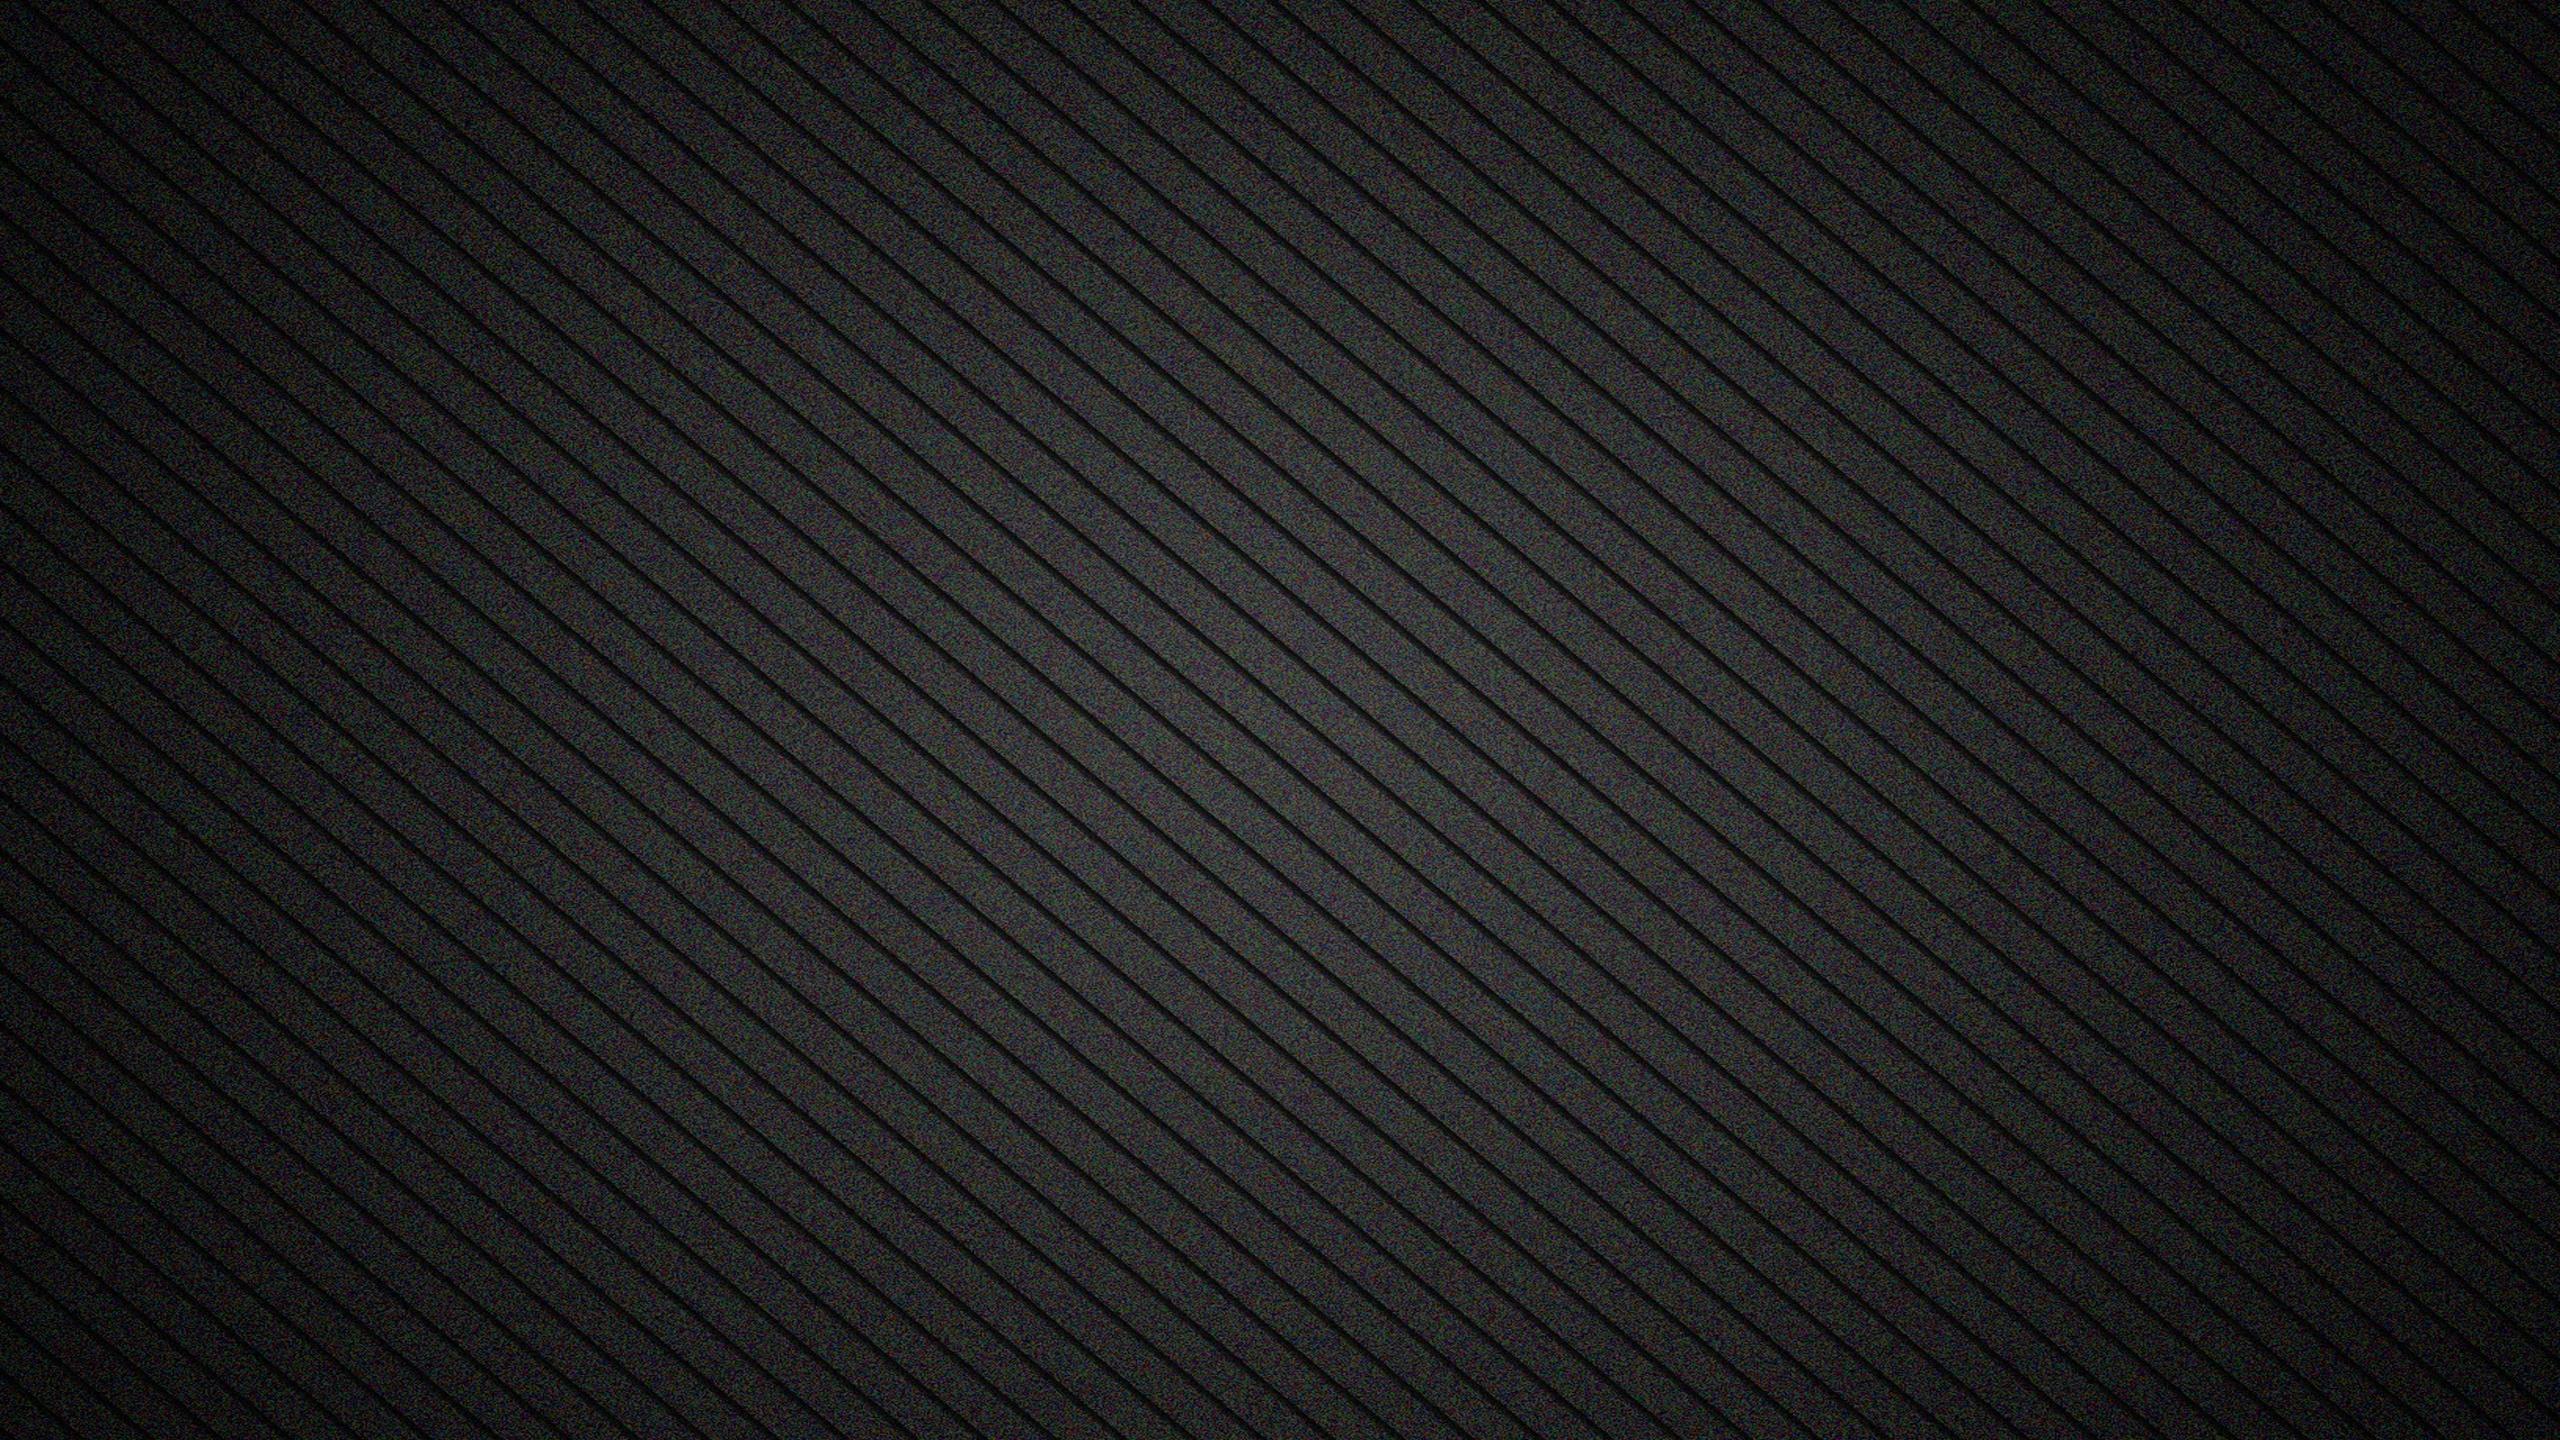 black wallpaper x - photo #28